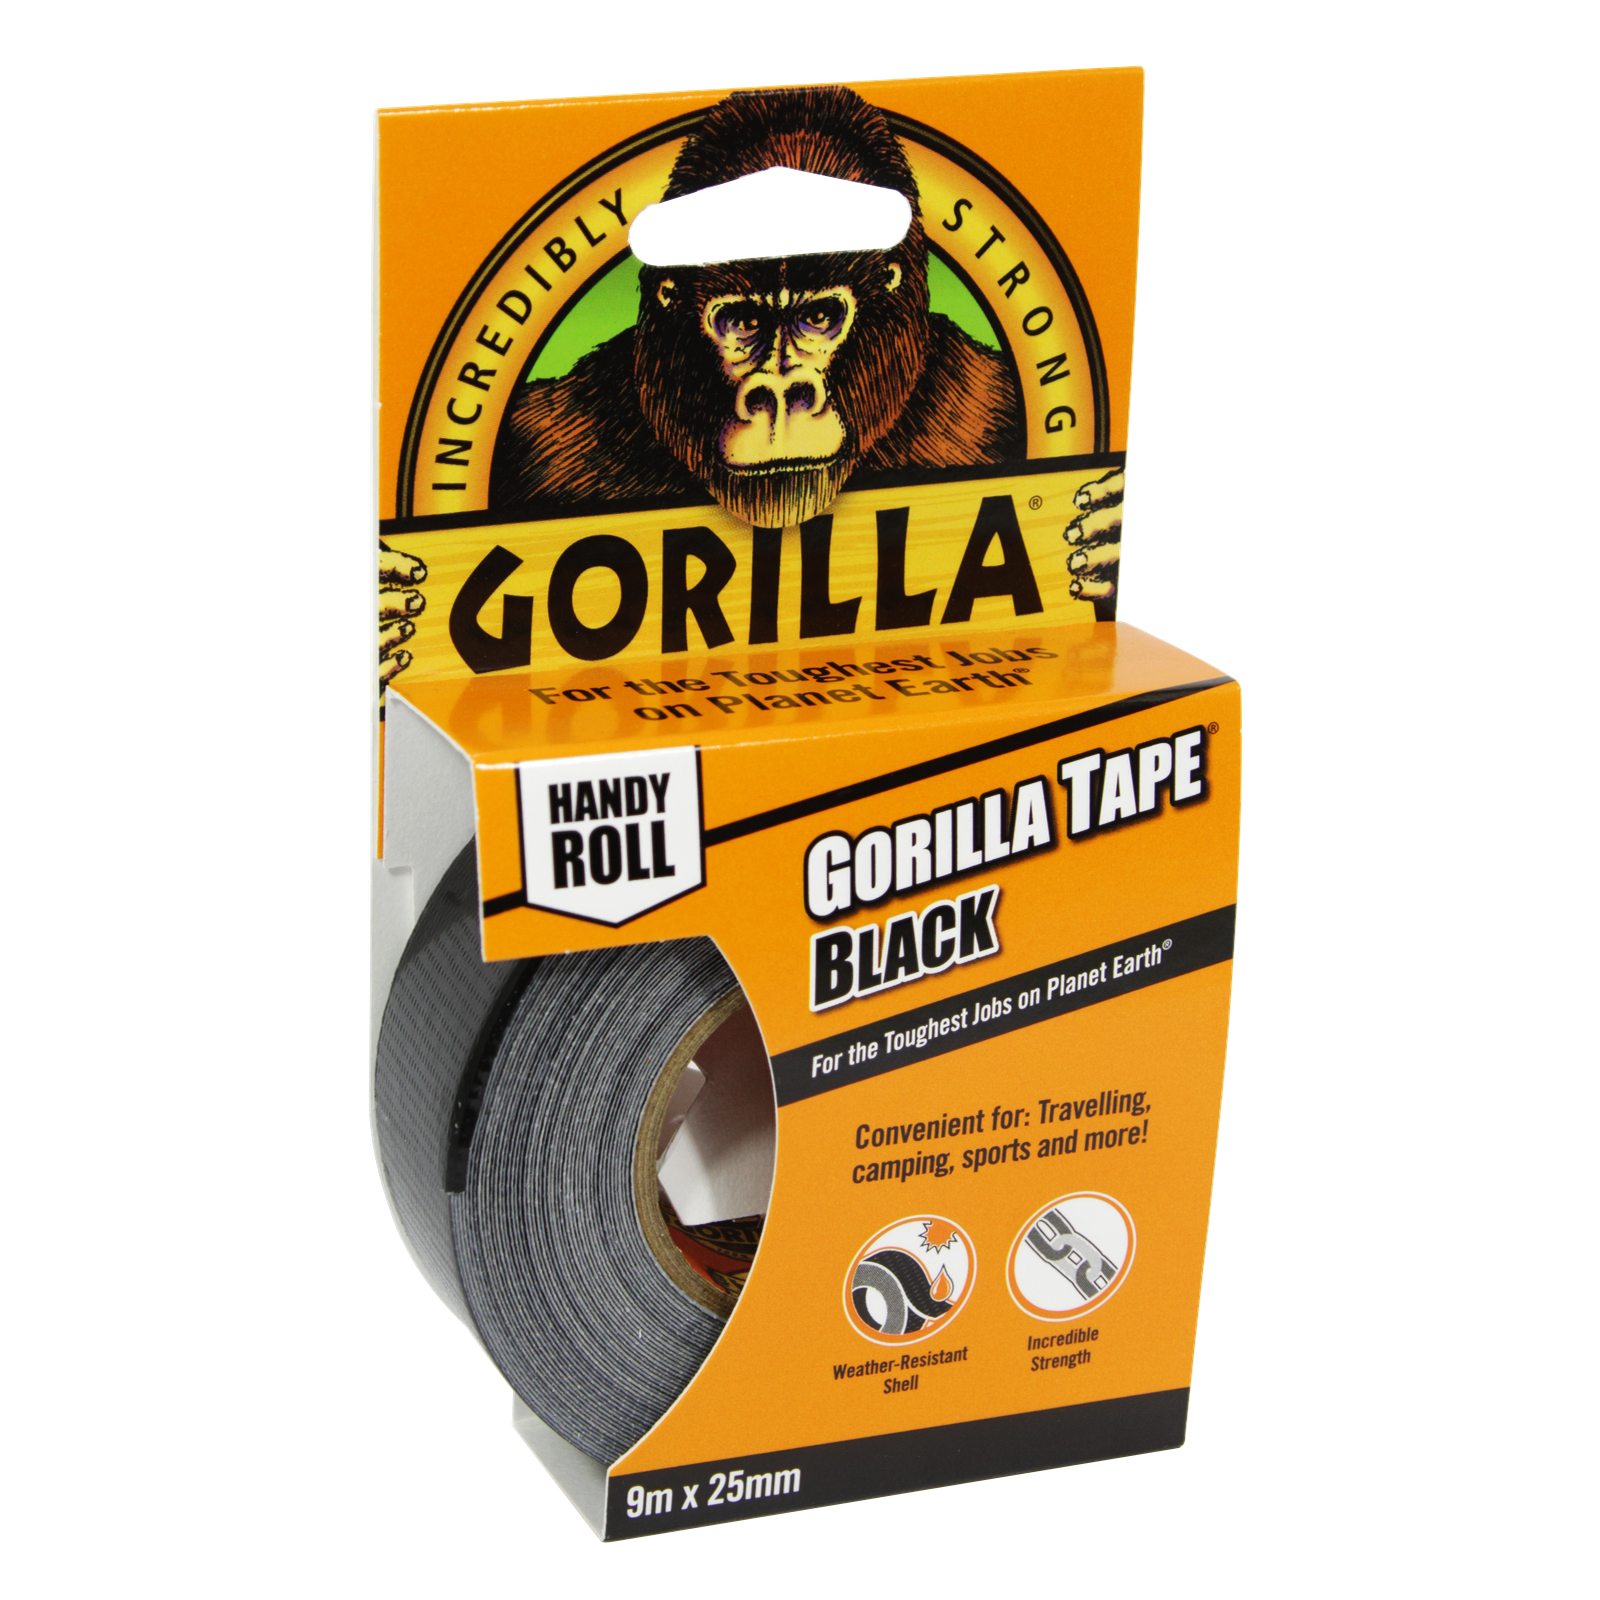 GORILLA TAPE HANDY ROLL 9M BLACK